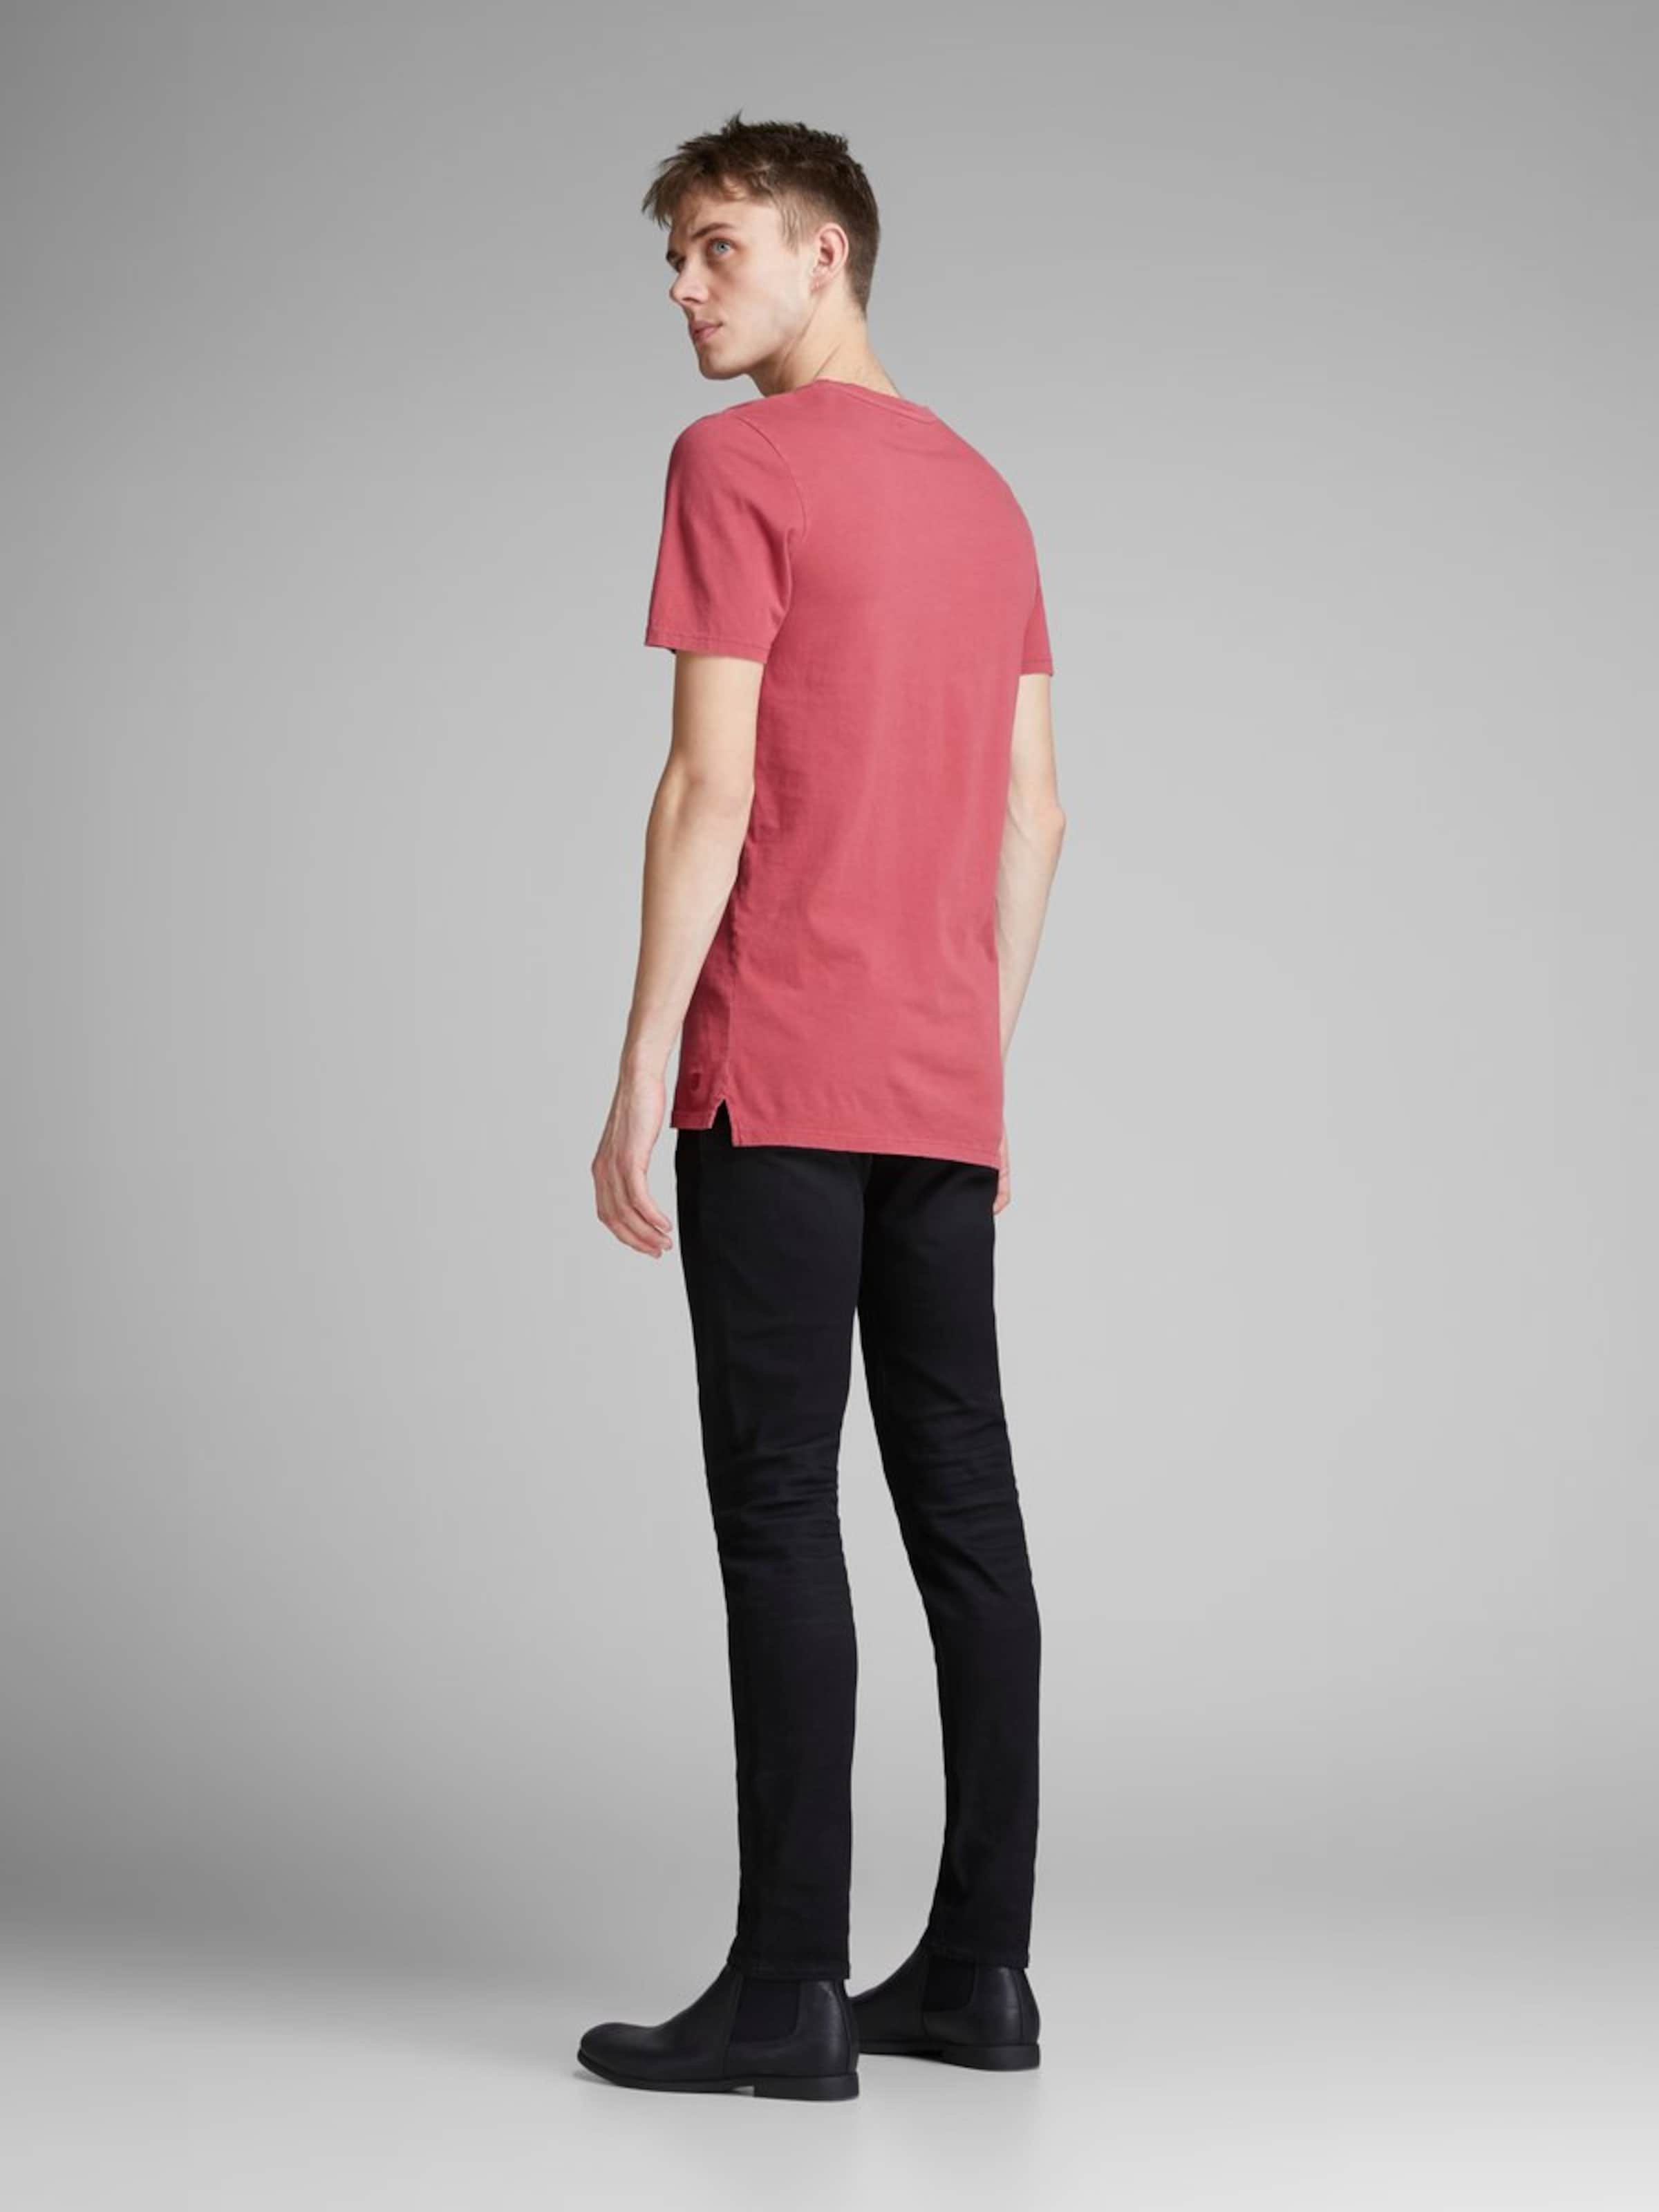 Jackamp; In PastellrotSchwarz Jones T shirt 34RjAL5